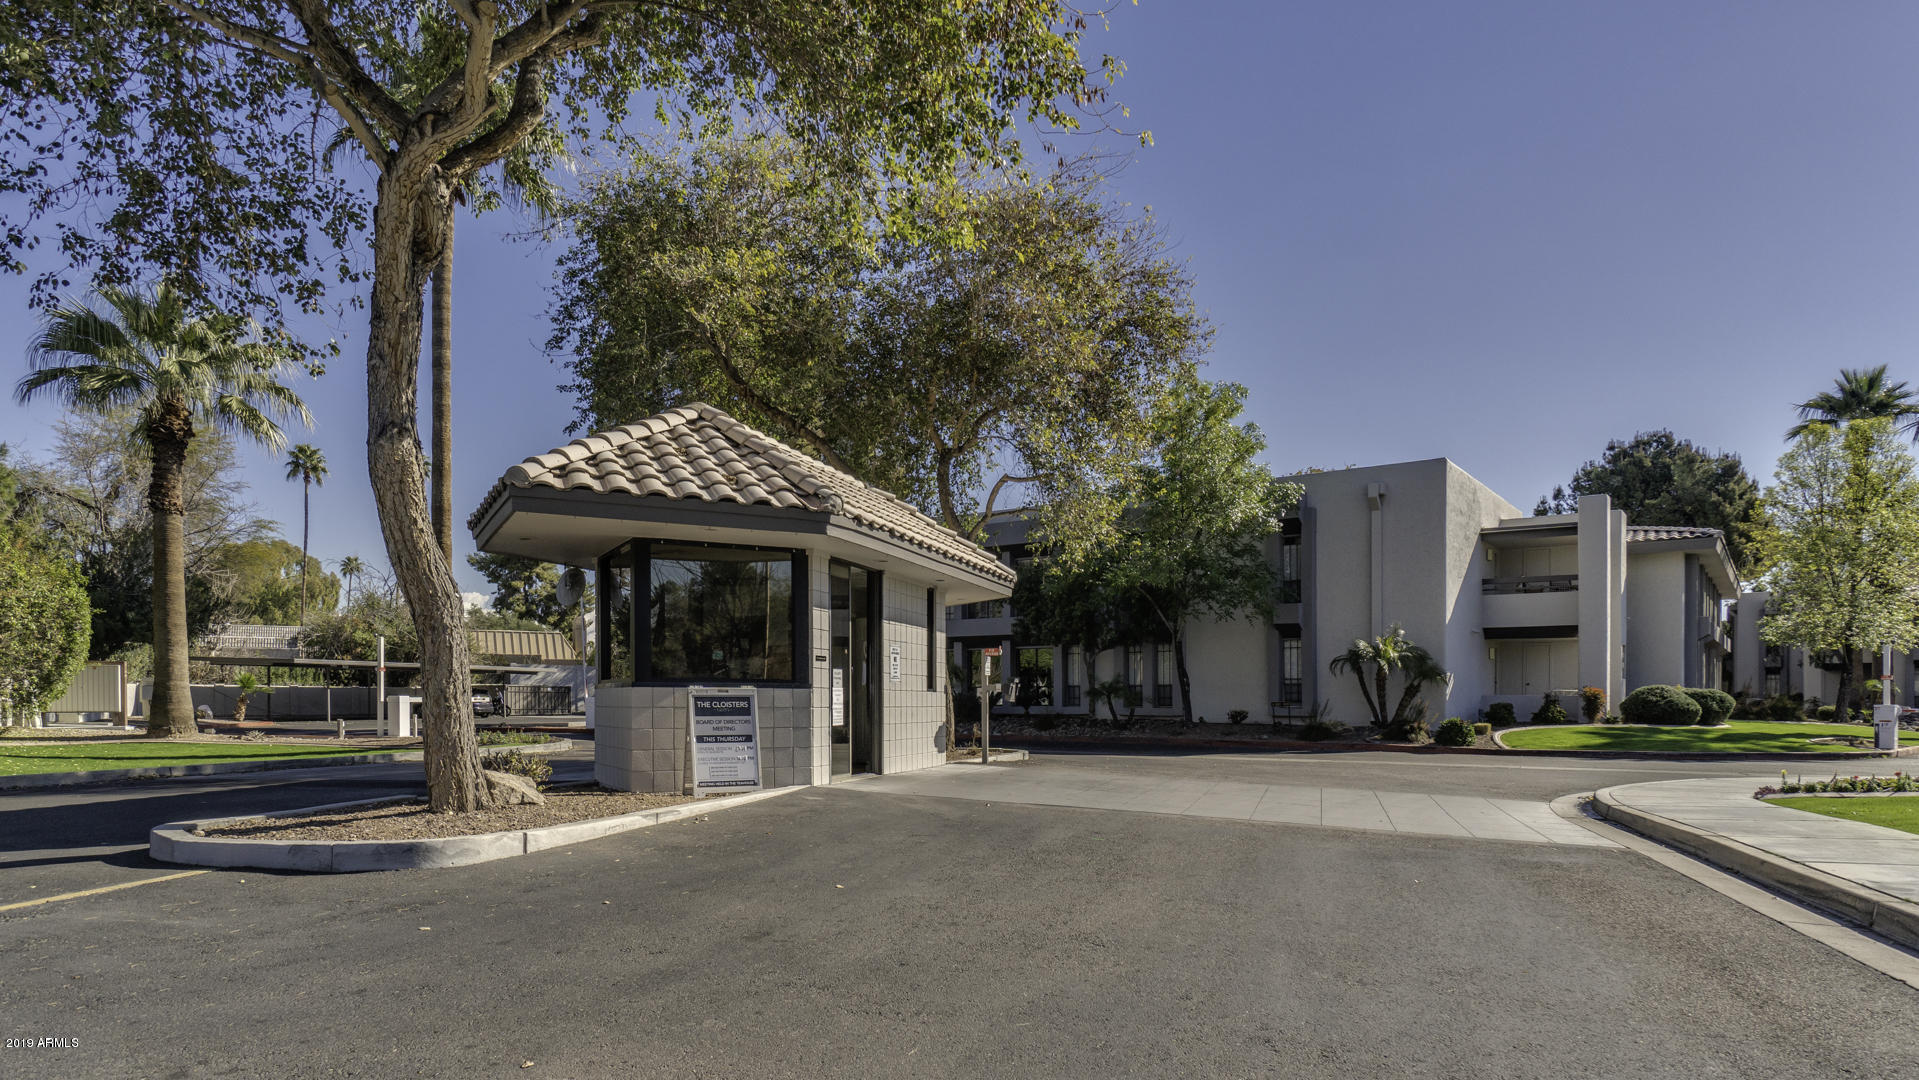 Photo for 5225 N 24th Street, Unit 205, Phoenix, AZ 85016 (MLS # 5824869)